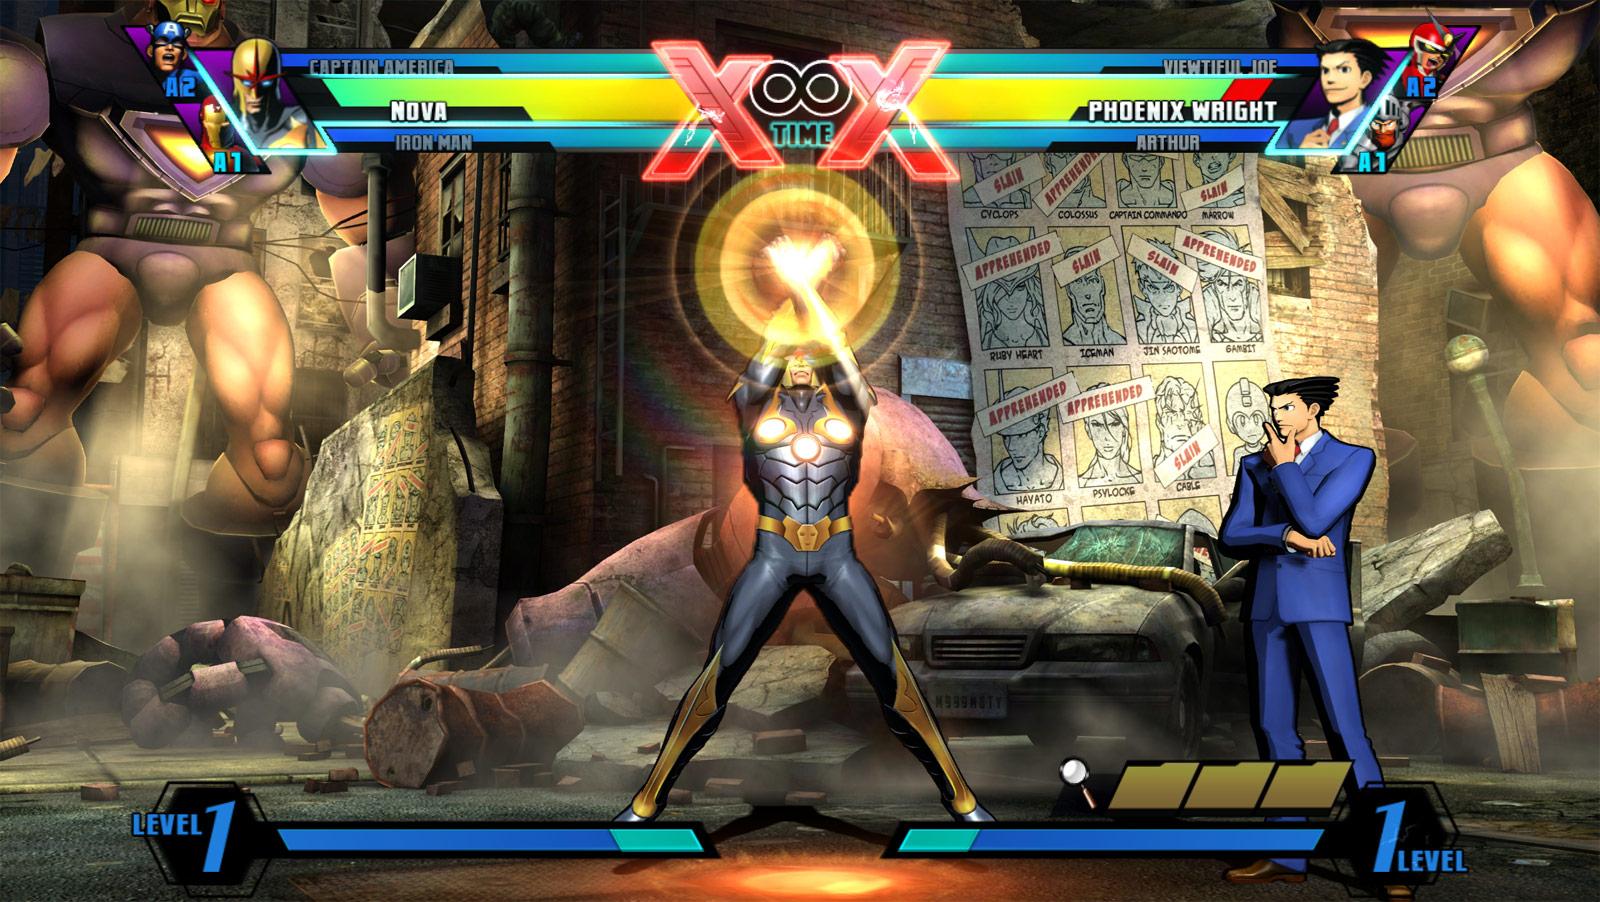 Phoenix Wright and Nova screens for Ultimate Marvel vs. Capcom 3 #2